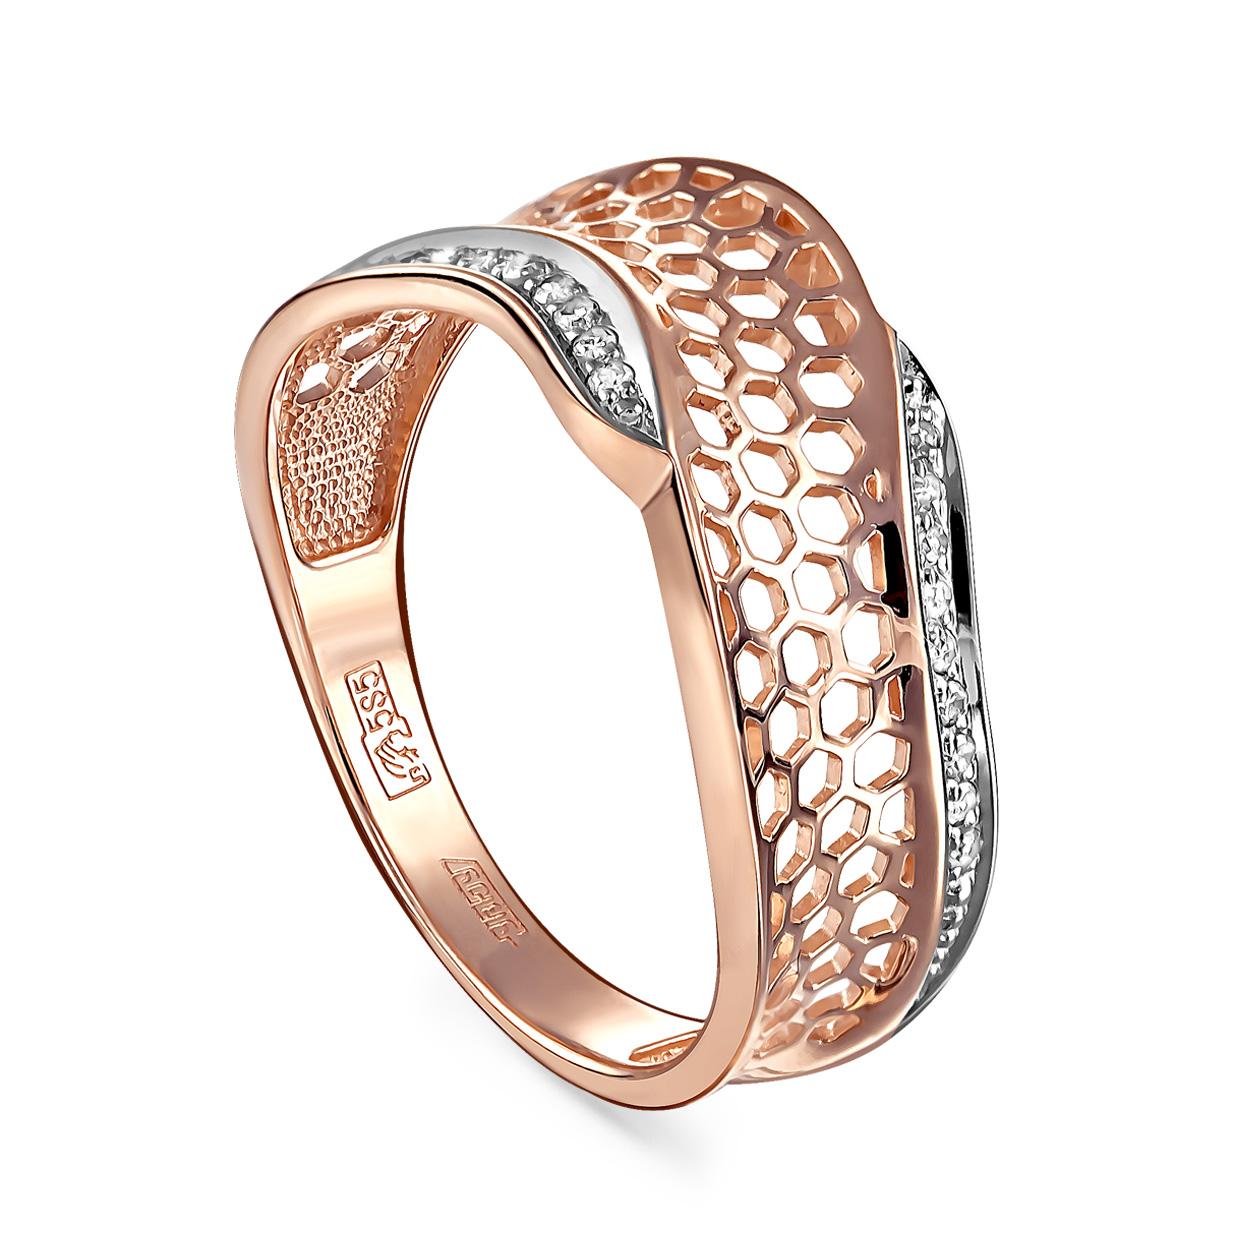 Золотое кольцо Бриллиант арт. 1-0491-1000 1-0491-1000